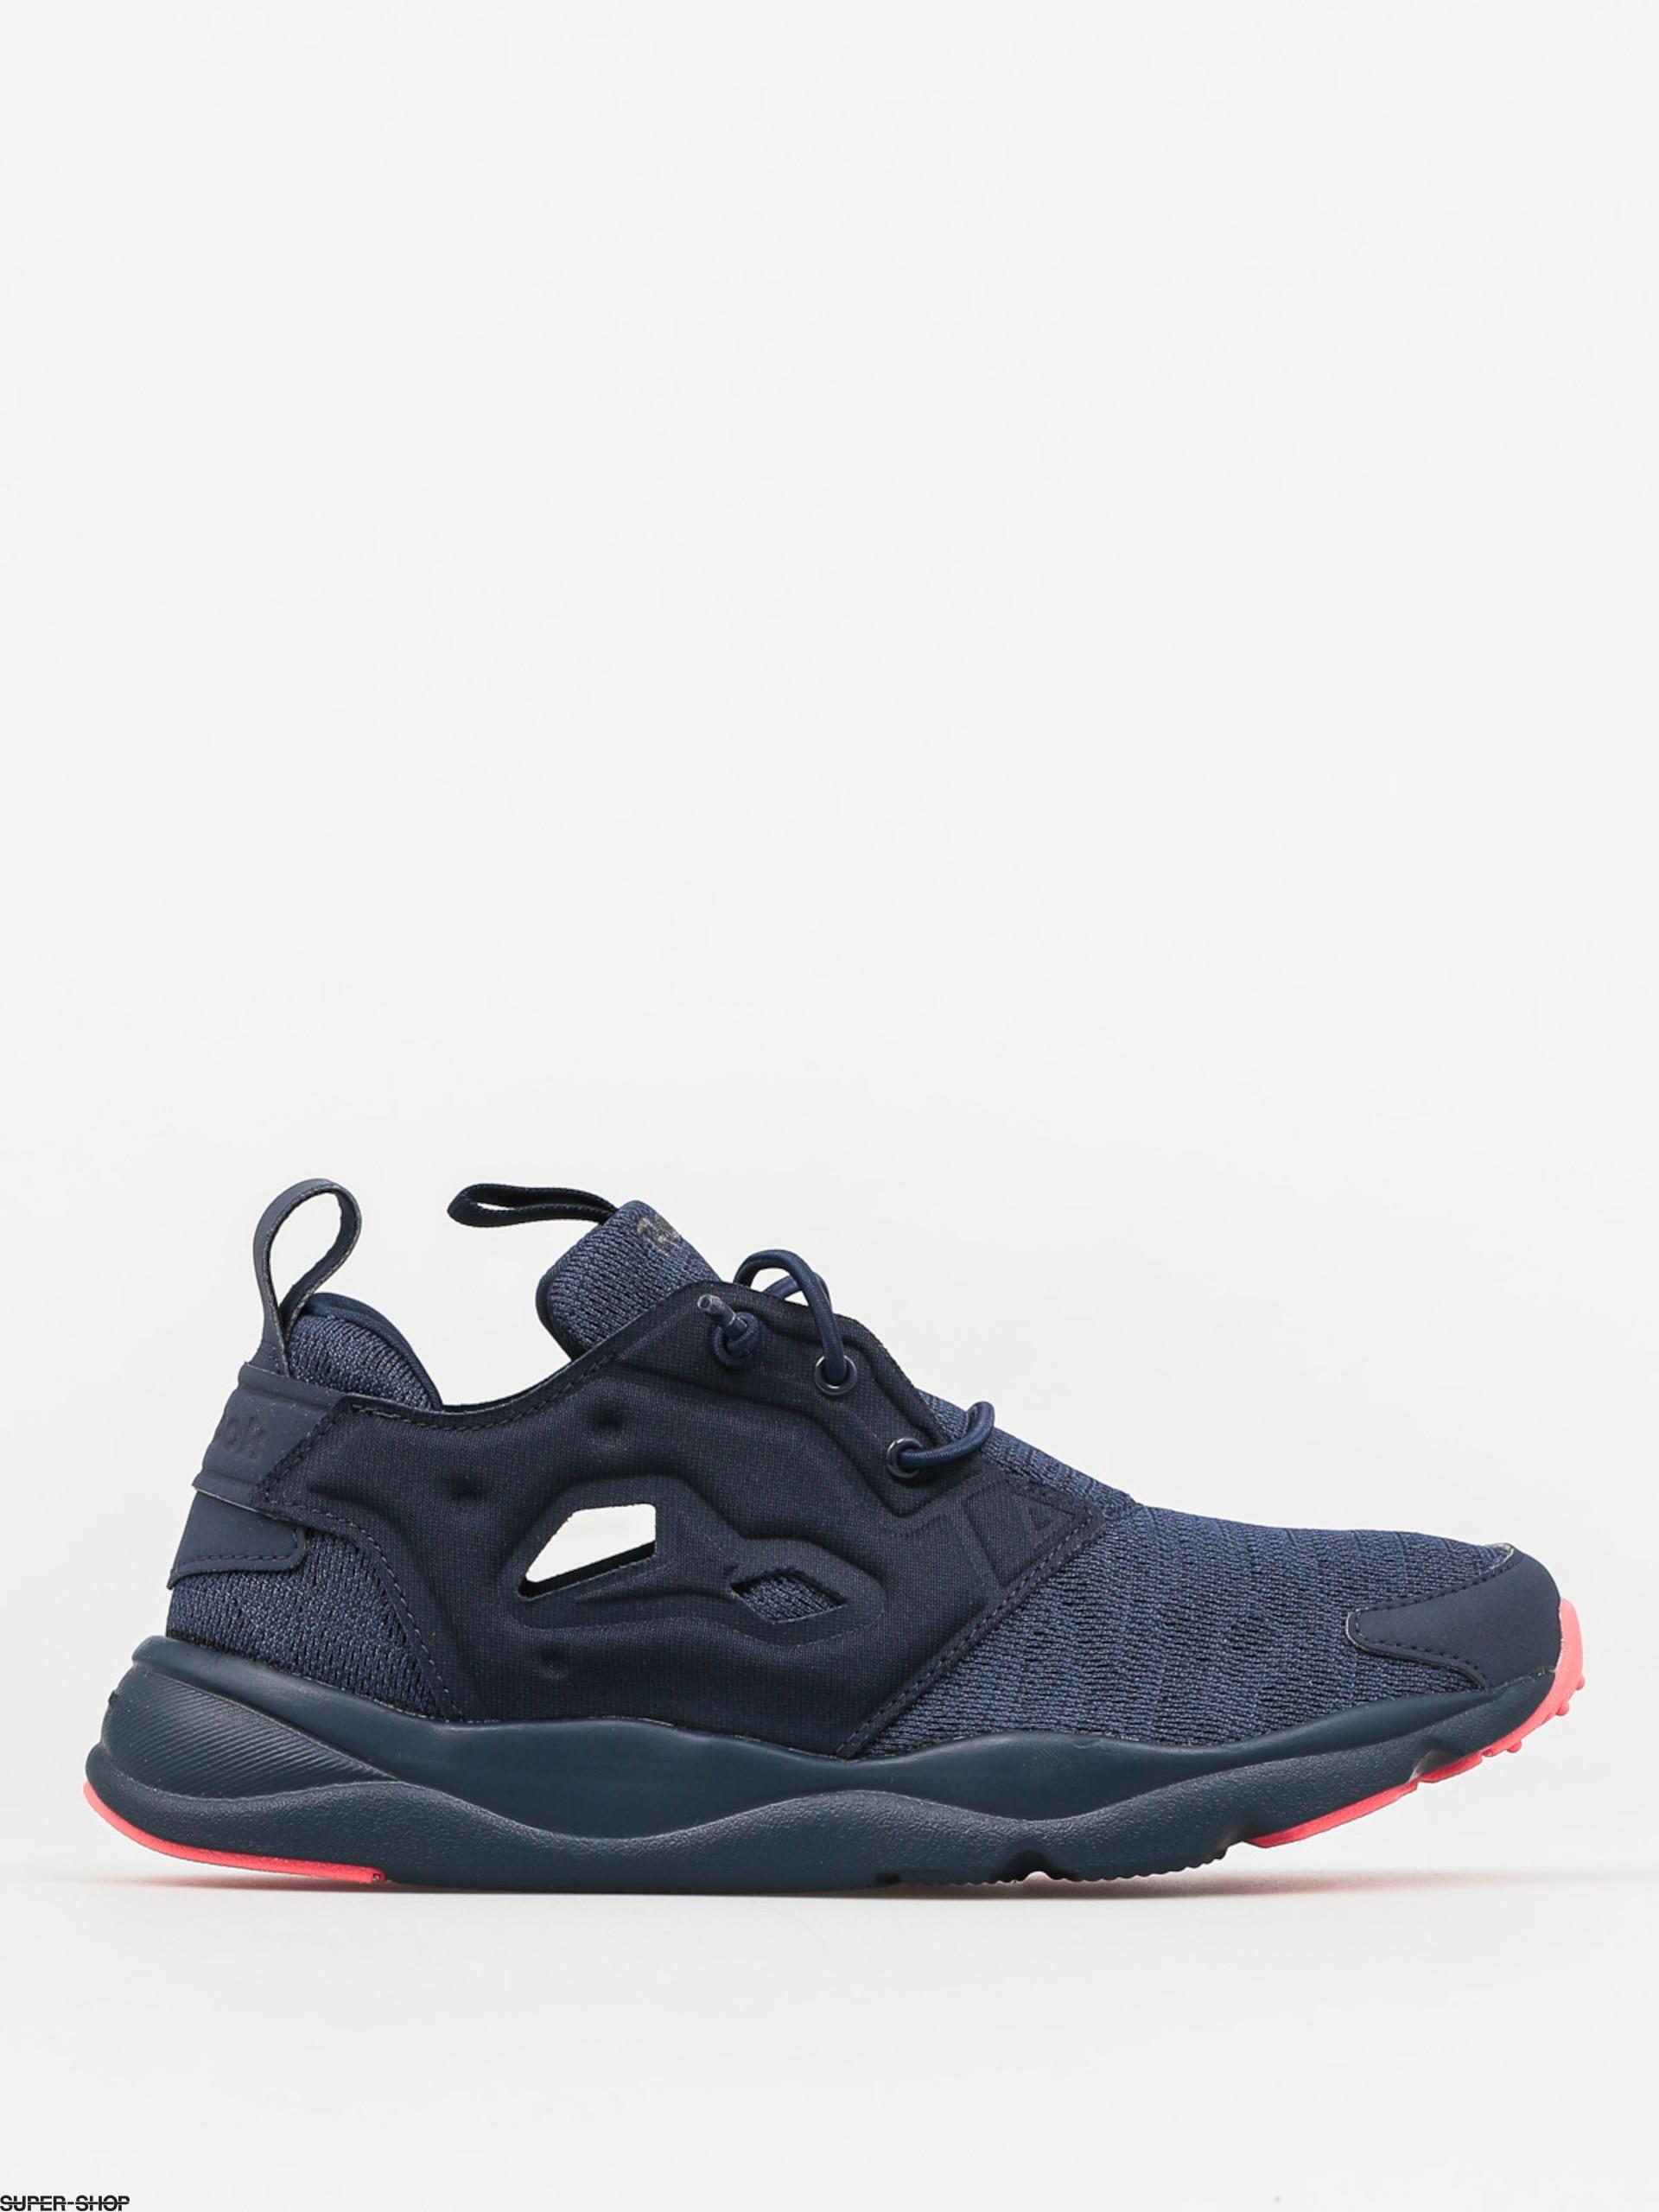 Reebok Shoes Furylite Sole Wmn